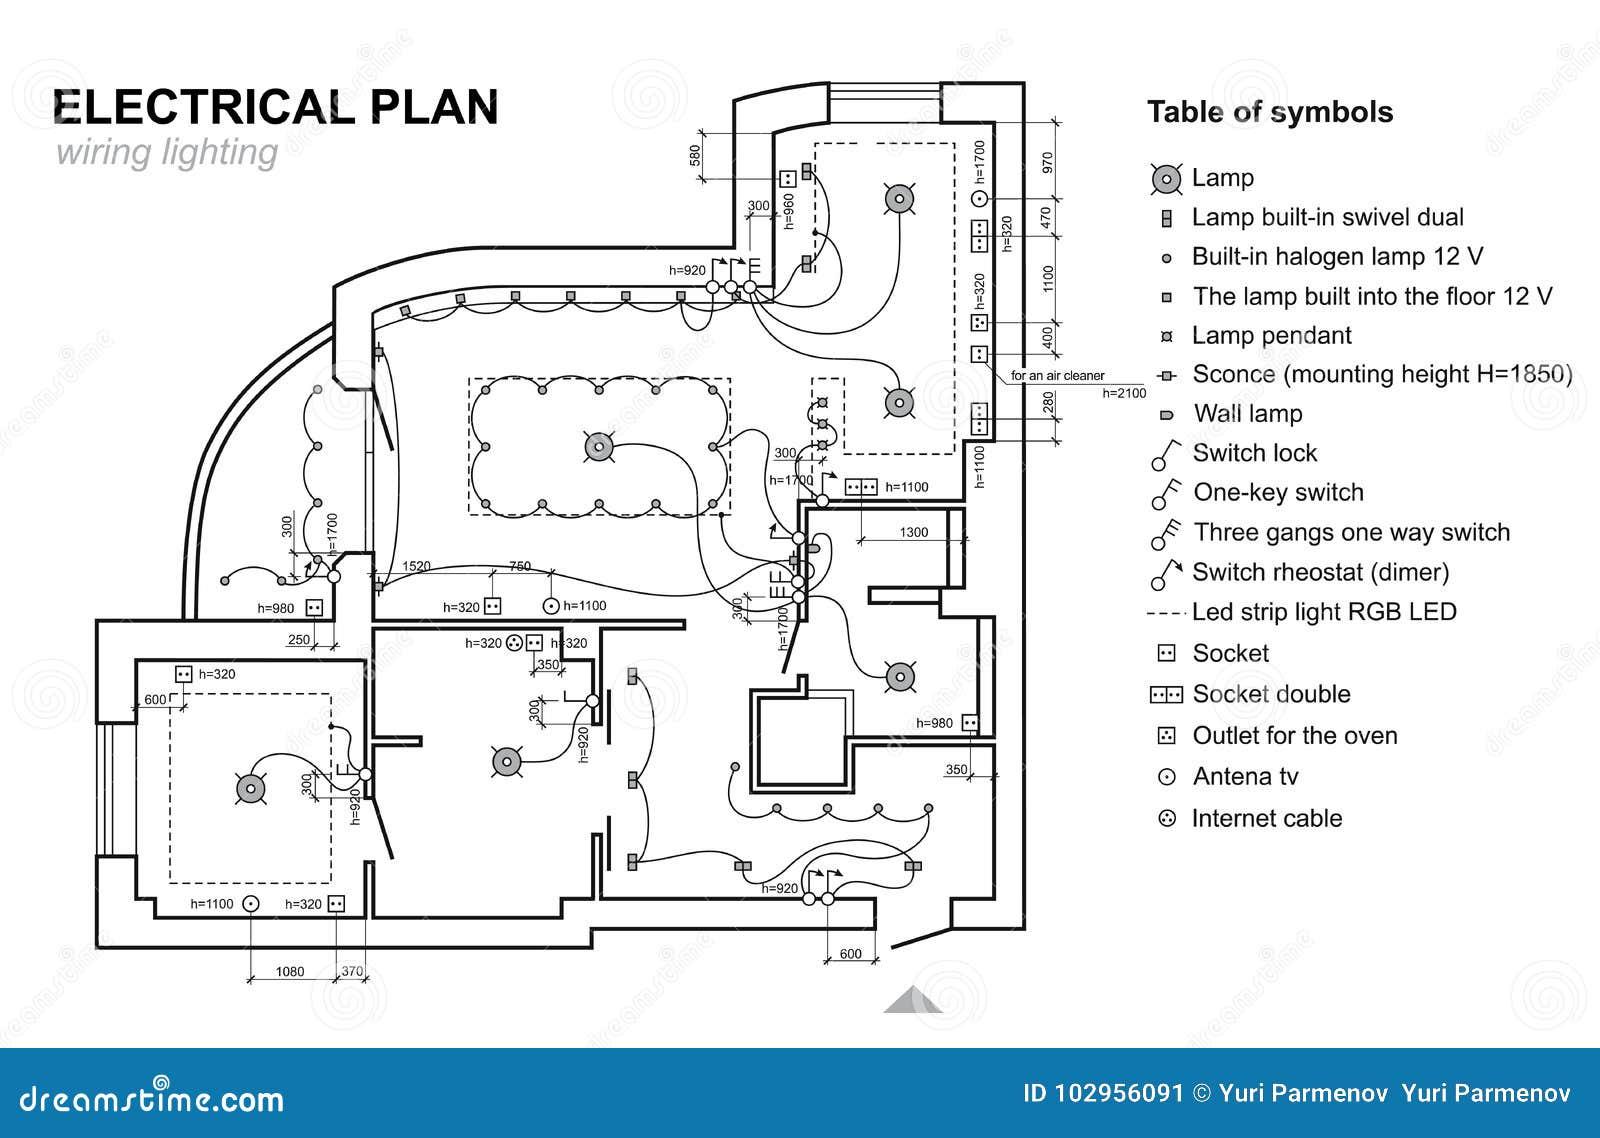 Hc2401h Honda Engine Wiring Diagram | Wiring Diagram on audio wiring panel, audio wiring kit, audio wiring accessories, audio wiring guide, seat harness, audio wiring connectors, audio battery, audio cable, audio power supply,